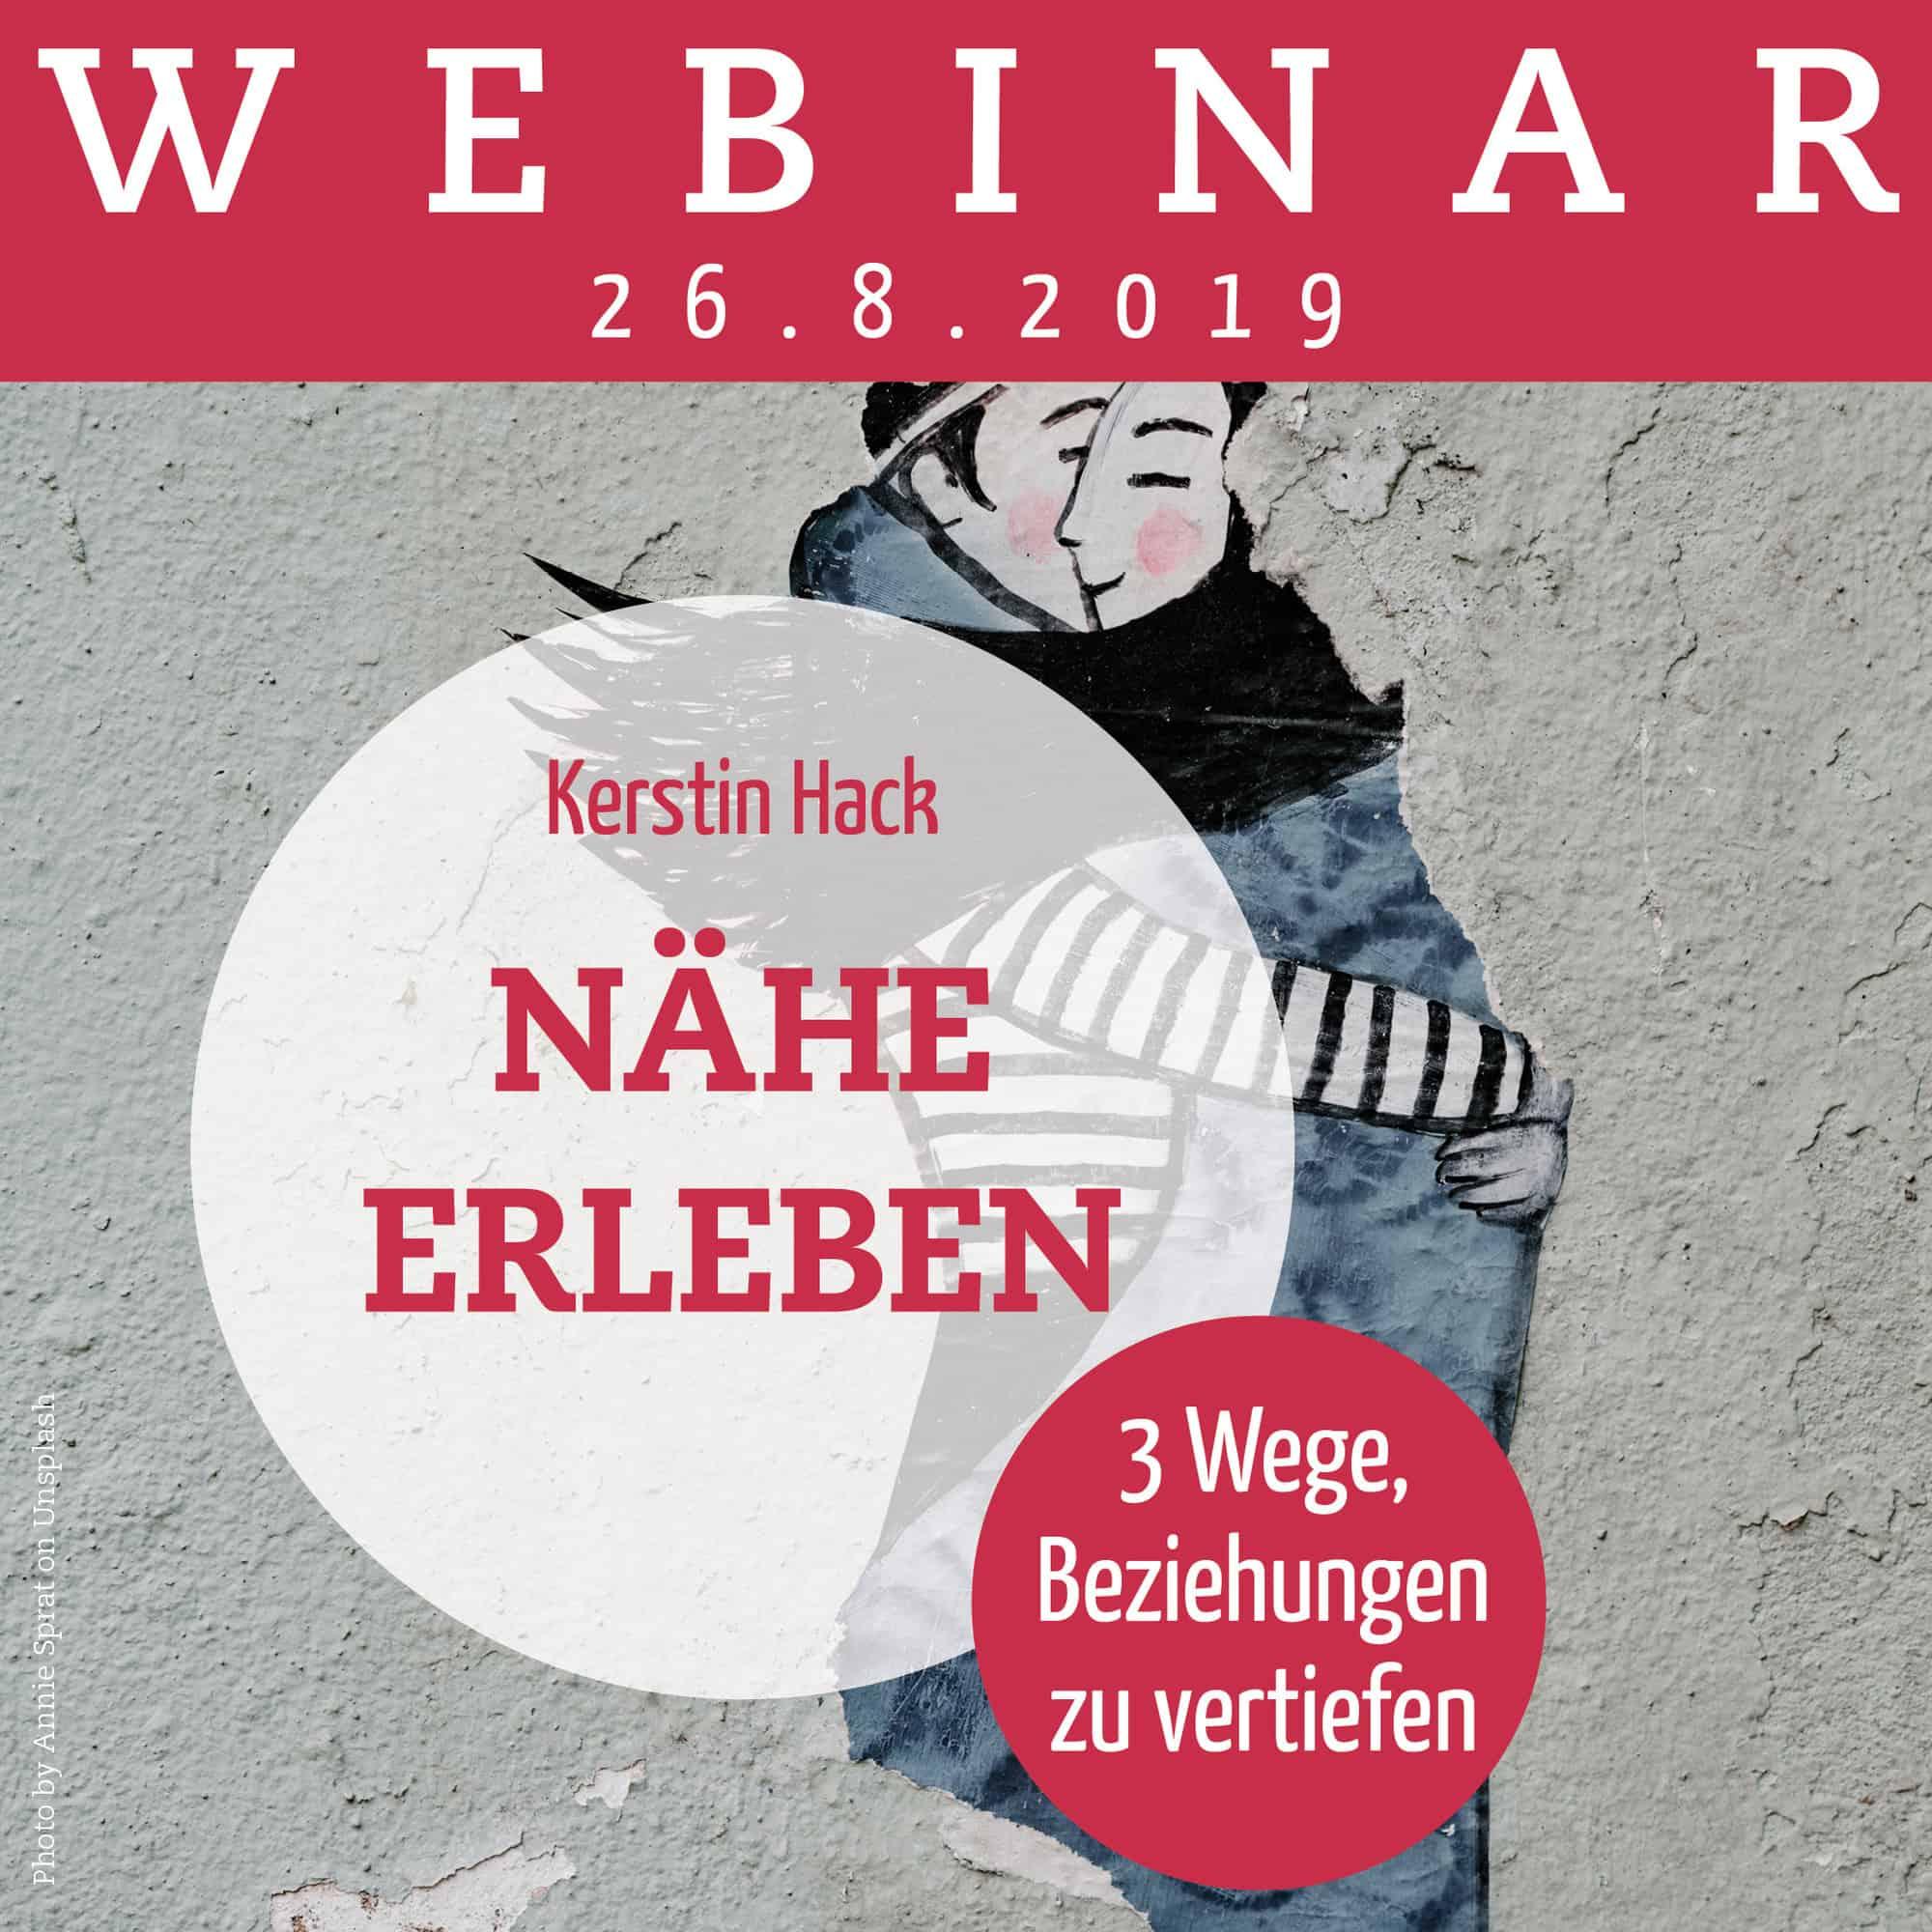 Webinar mit Kerstin Hack: Nähe erleben. Am 26.08.